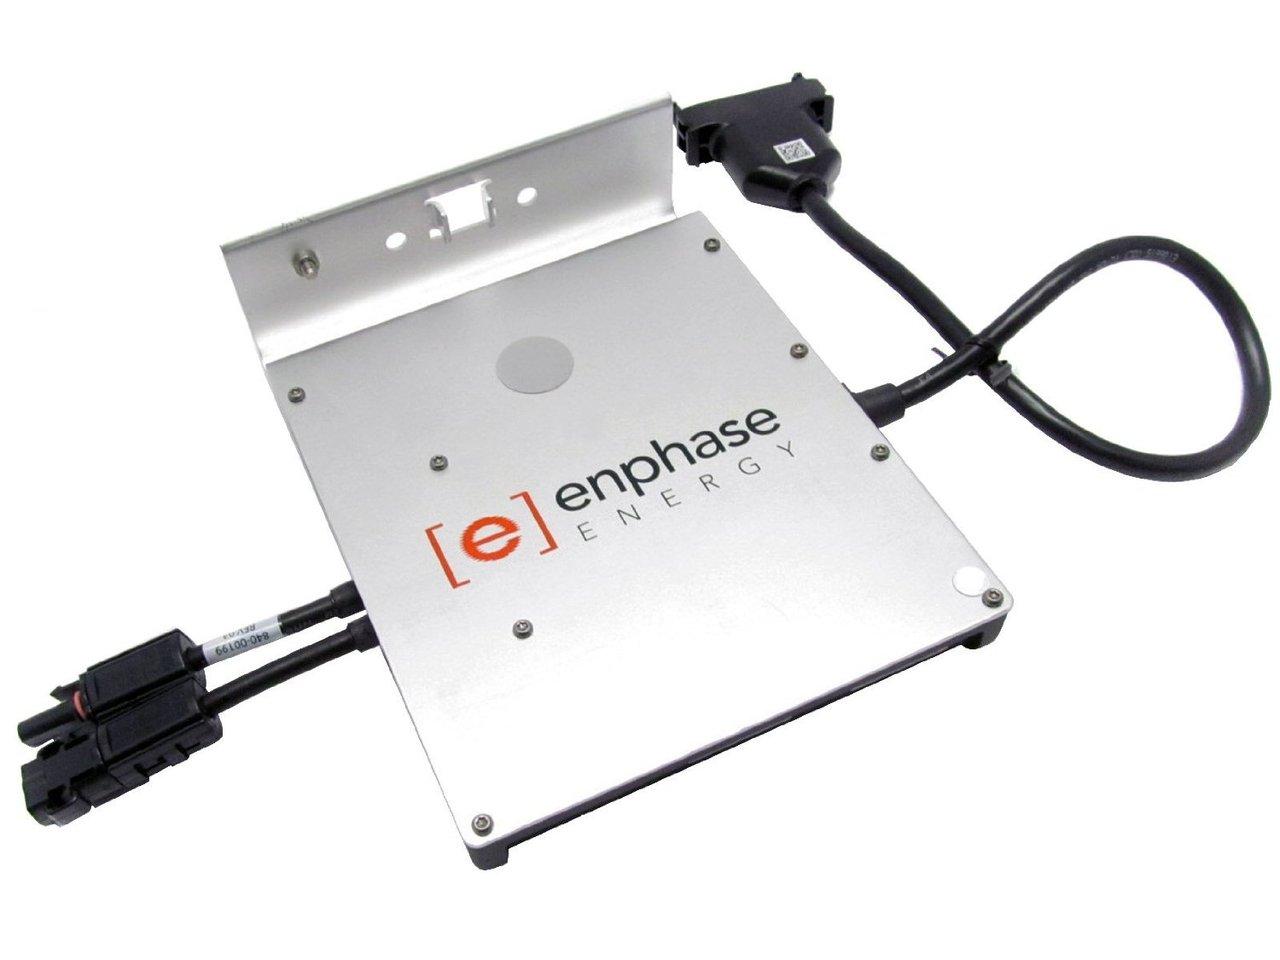 Enphase Energy Microinverter (M215-60-2LL-S22-IG)